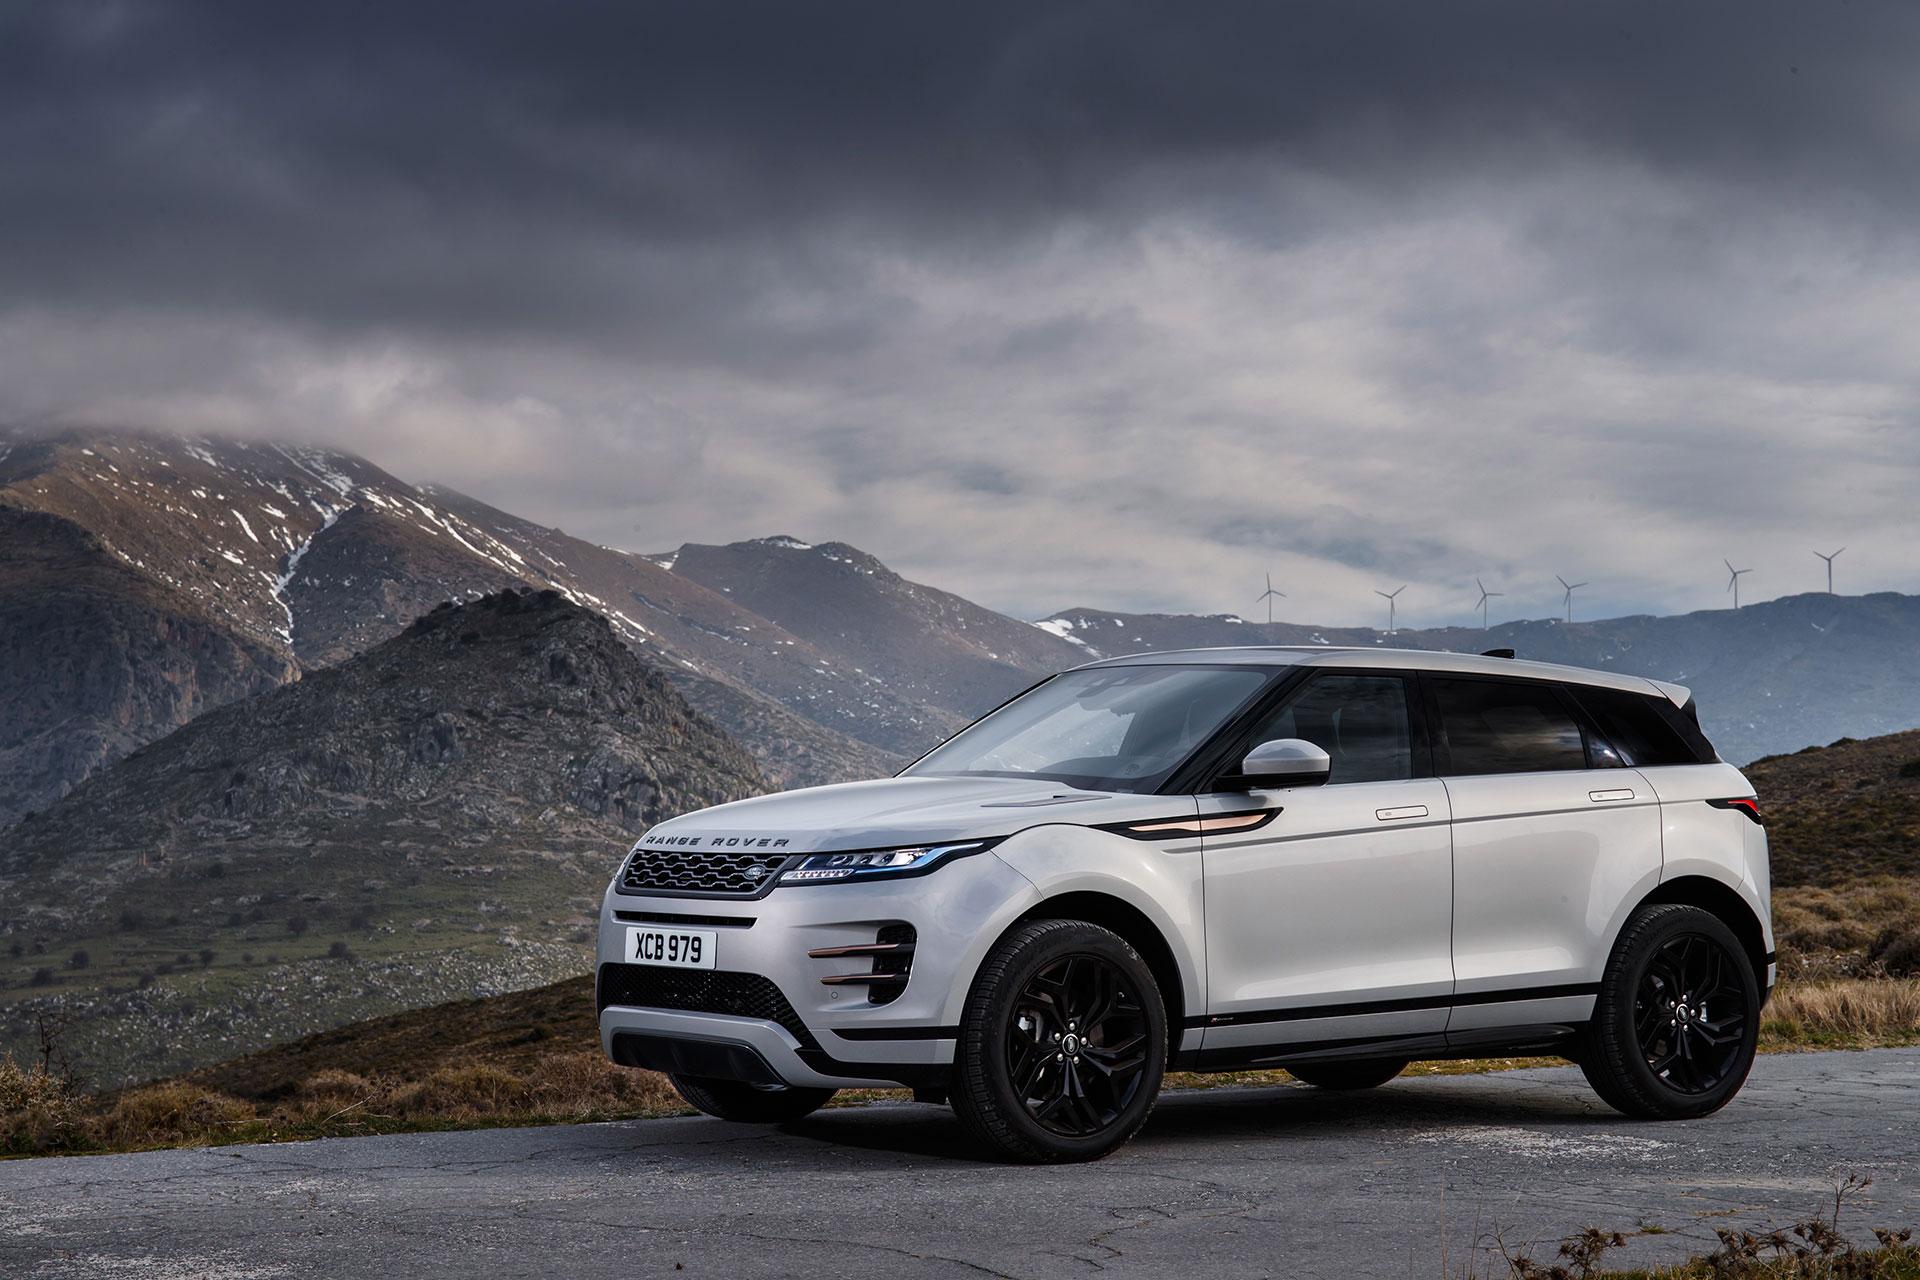 Range Rover Evoque 2019 Gris Exterior 18